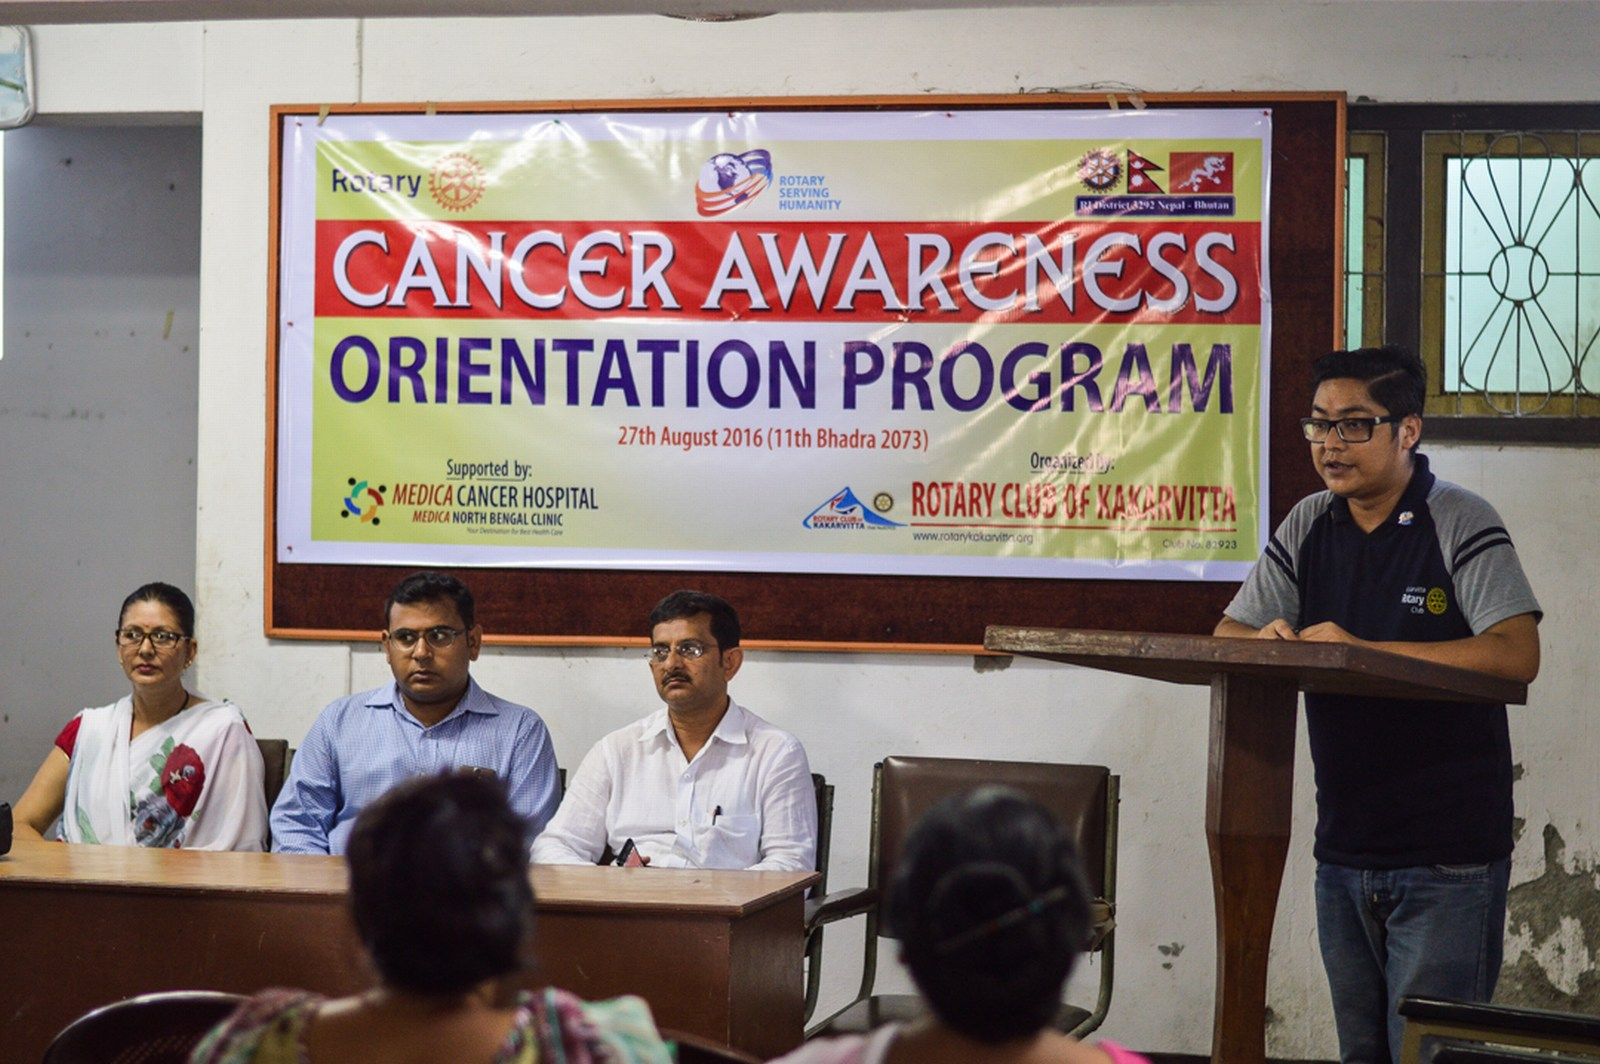 Cancer-Awareness-Orientation-Program-2016-Rotary-Club-of-Kakarvitta-2